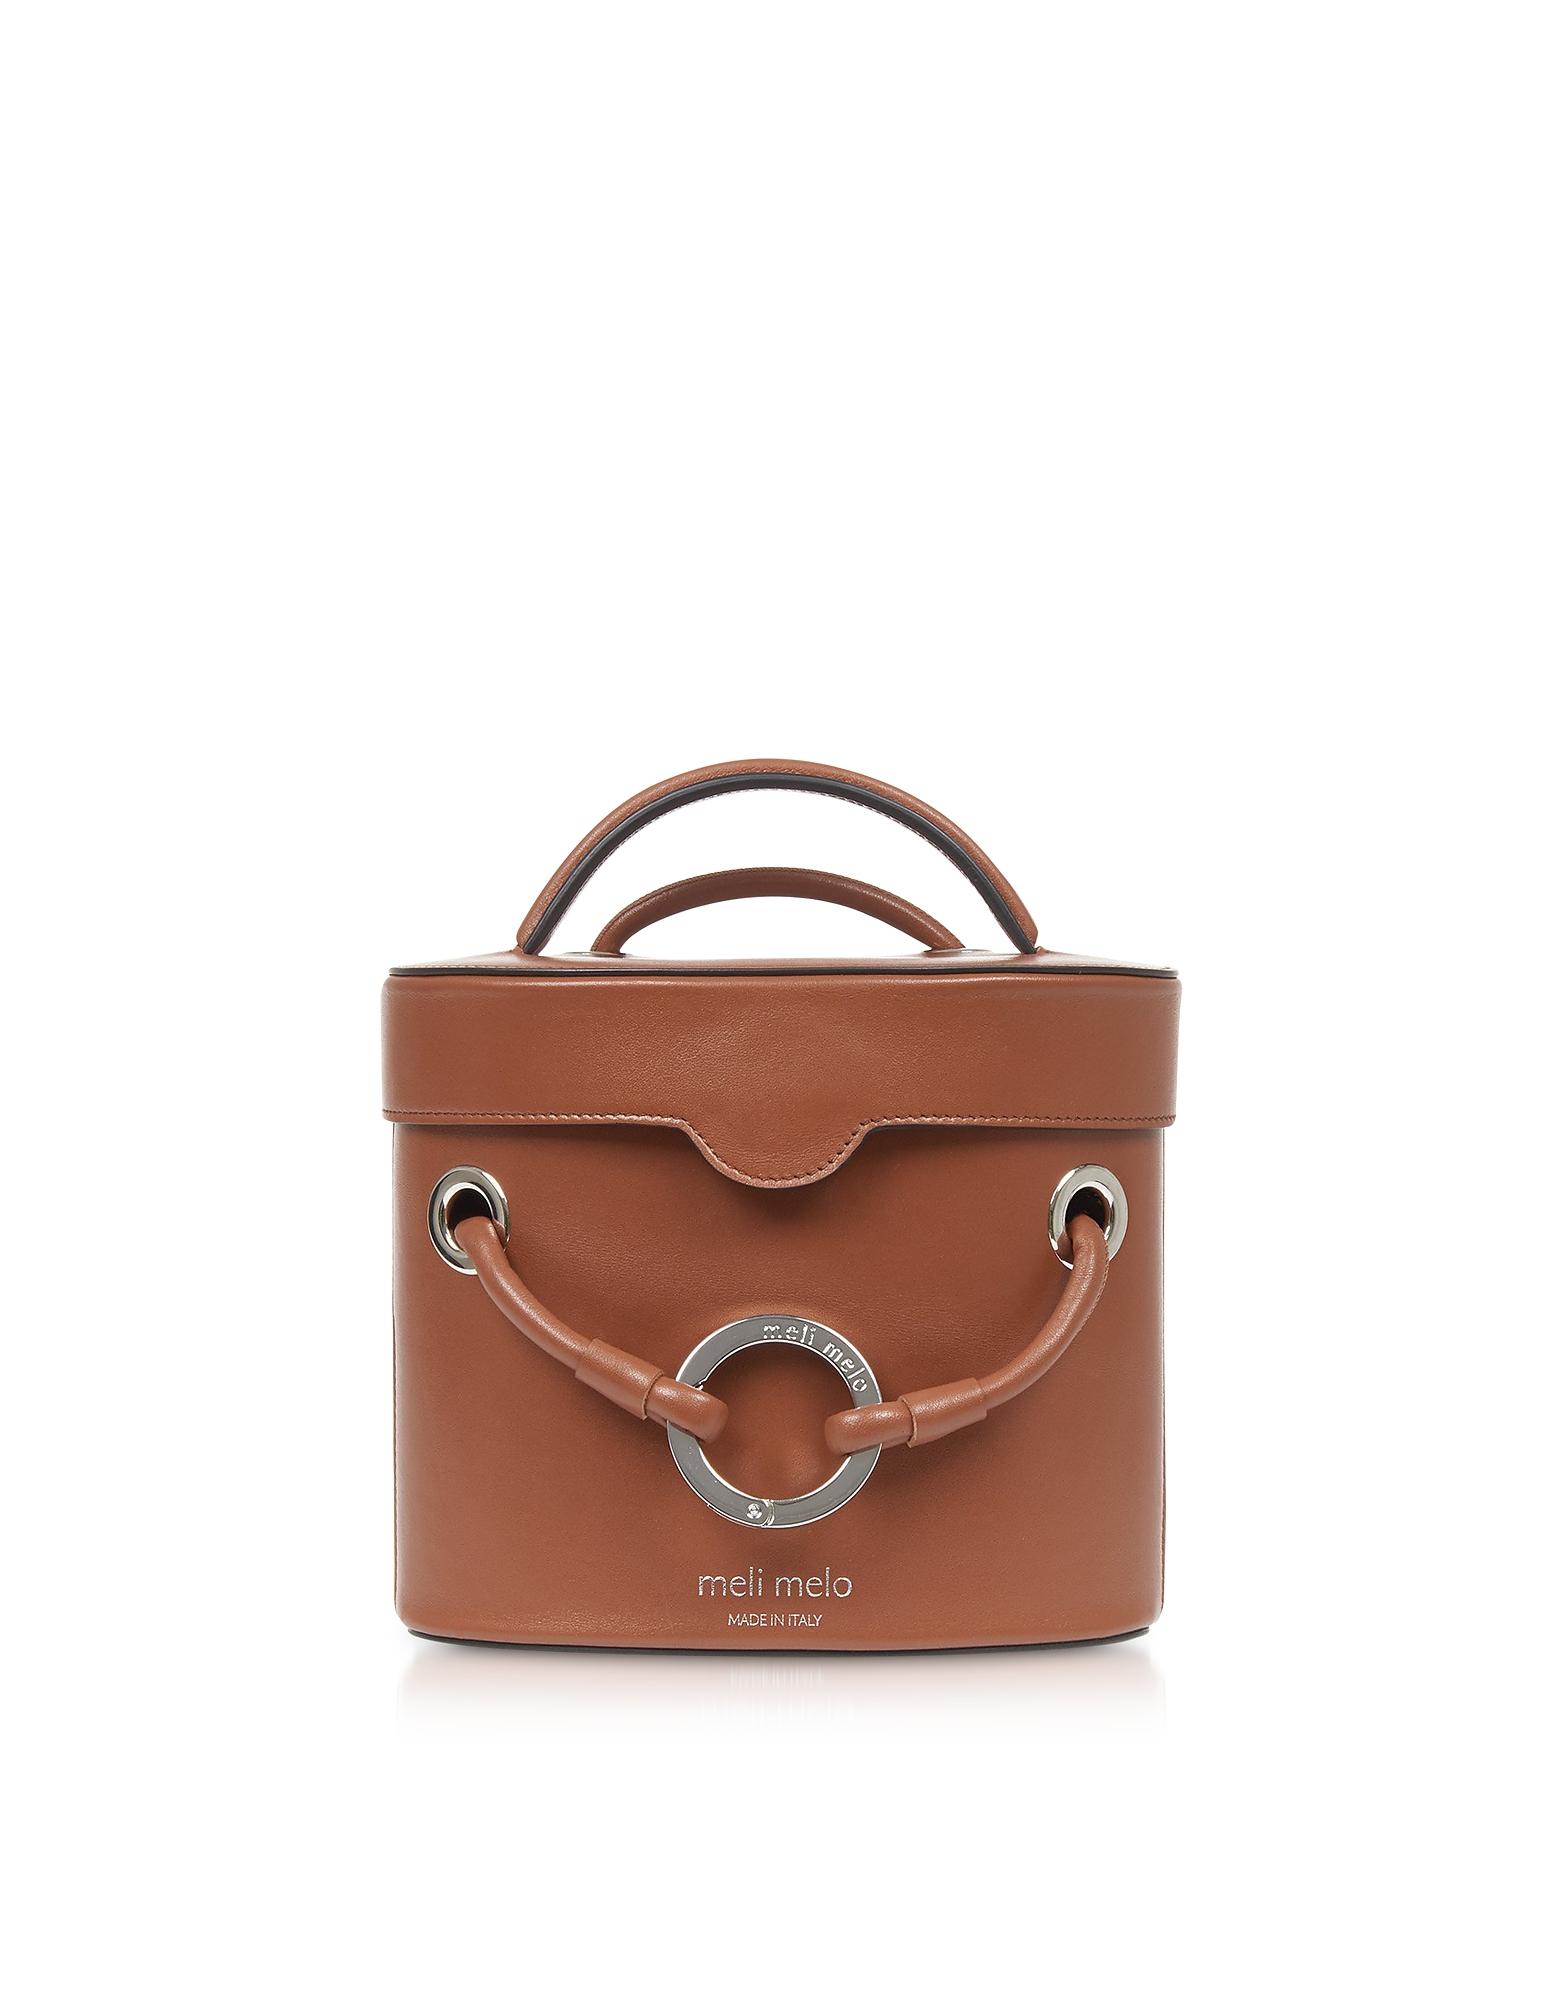 Meli Melo Handbags, Nancy Almond Shoulder Bag